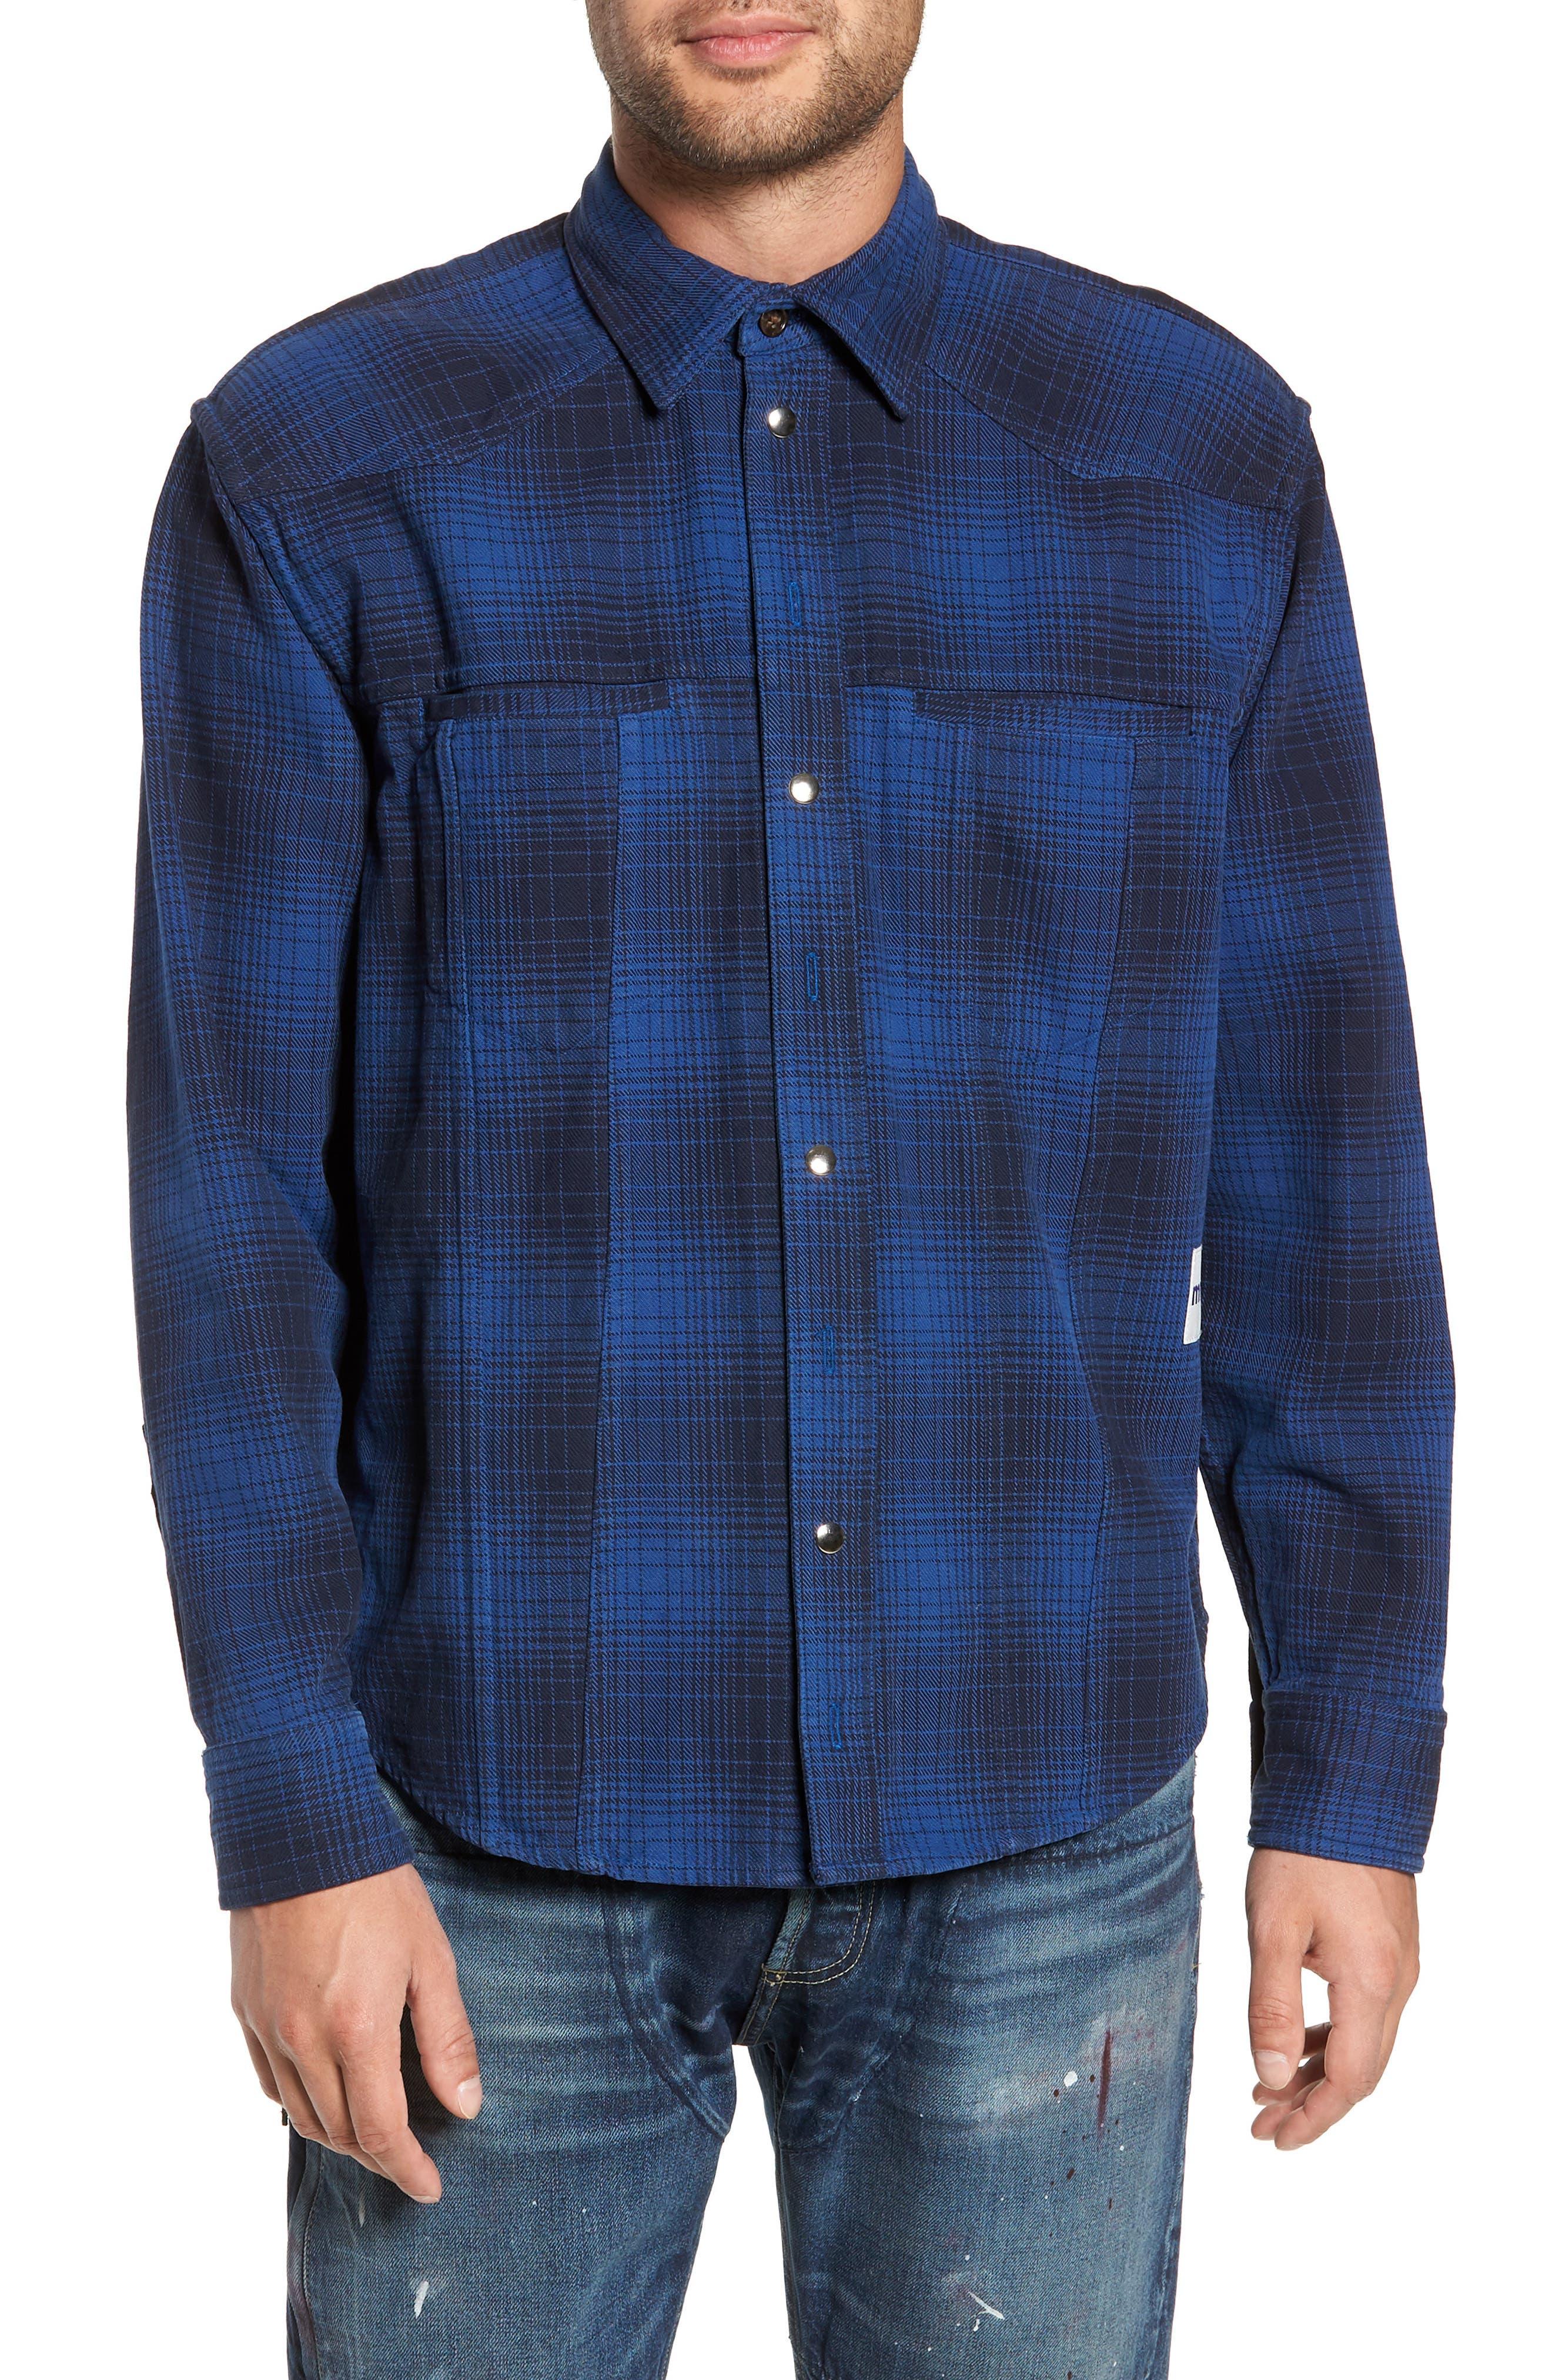 MR. COMPLETELY Western Flannel Slim Shirt in Blue